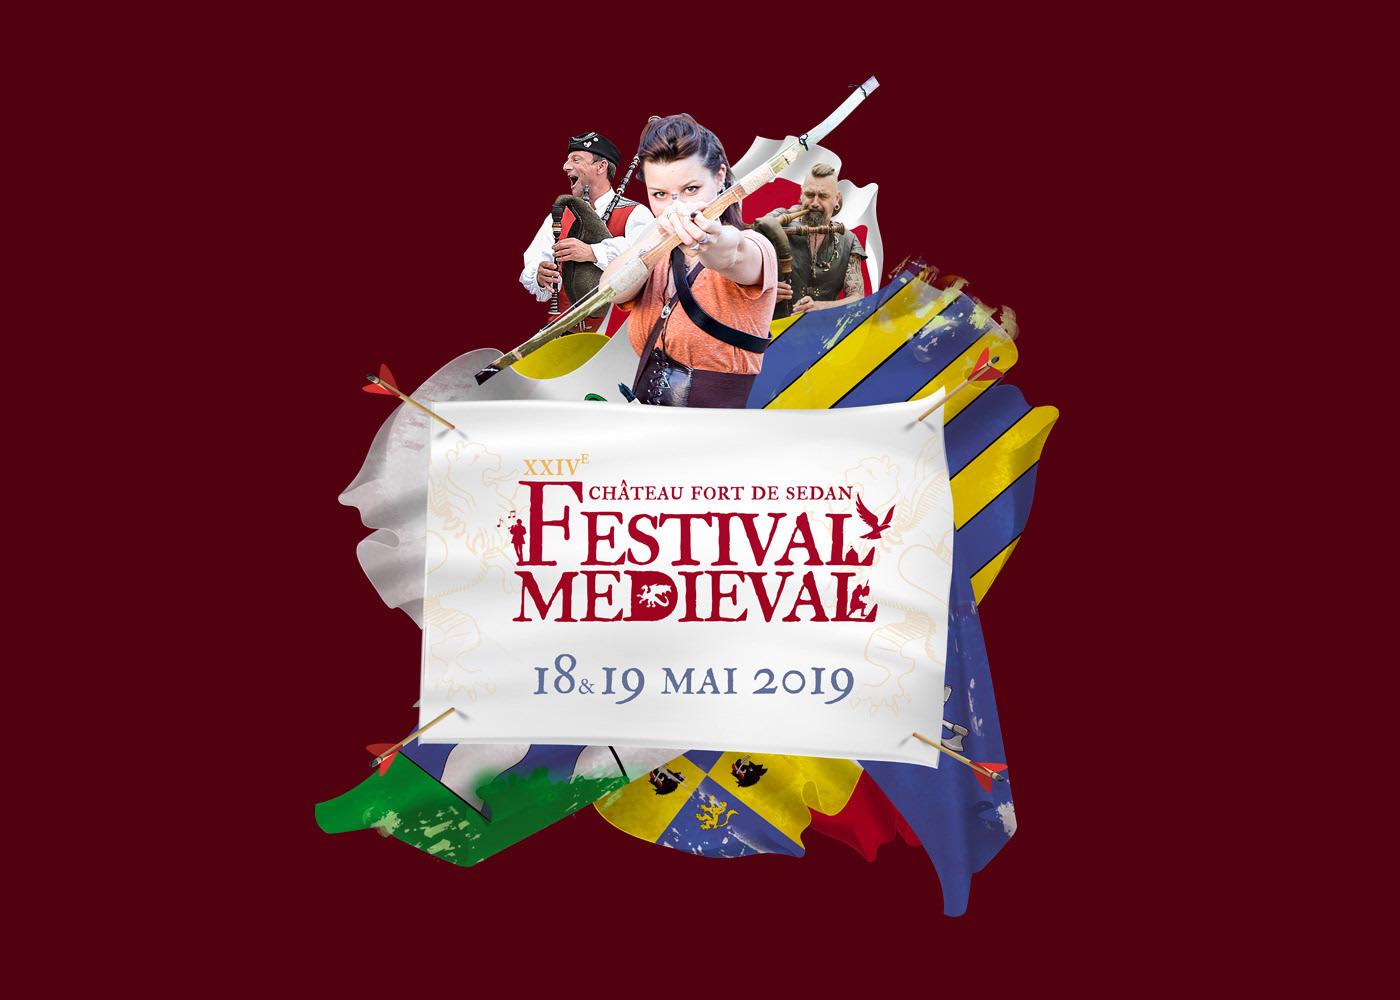 Festival mediéval Sedan affiche